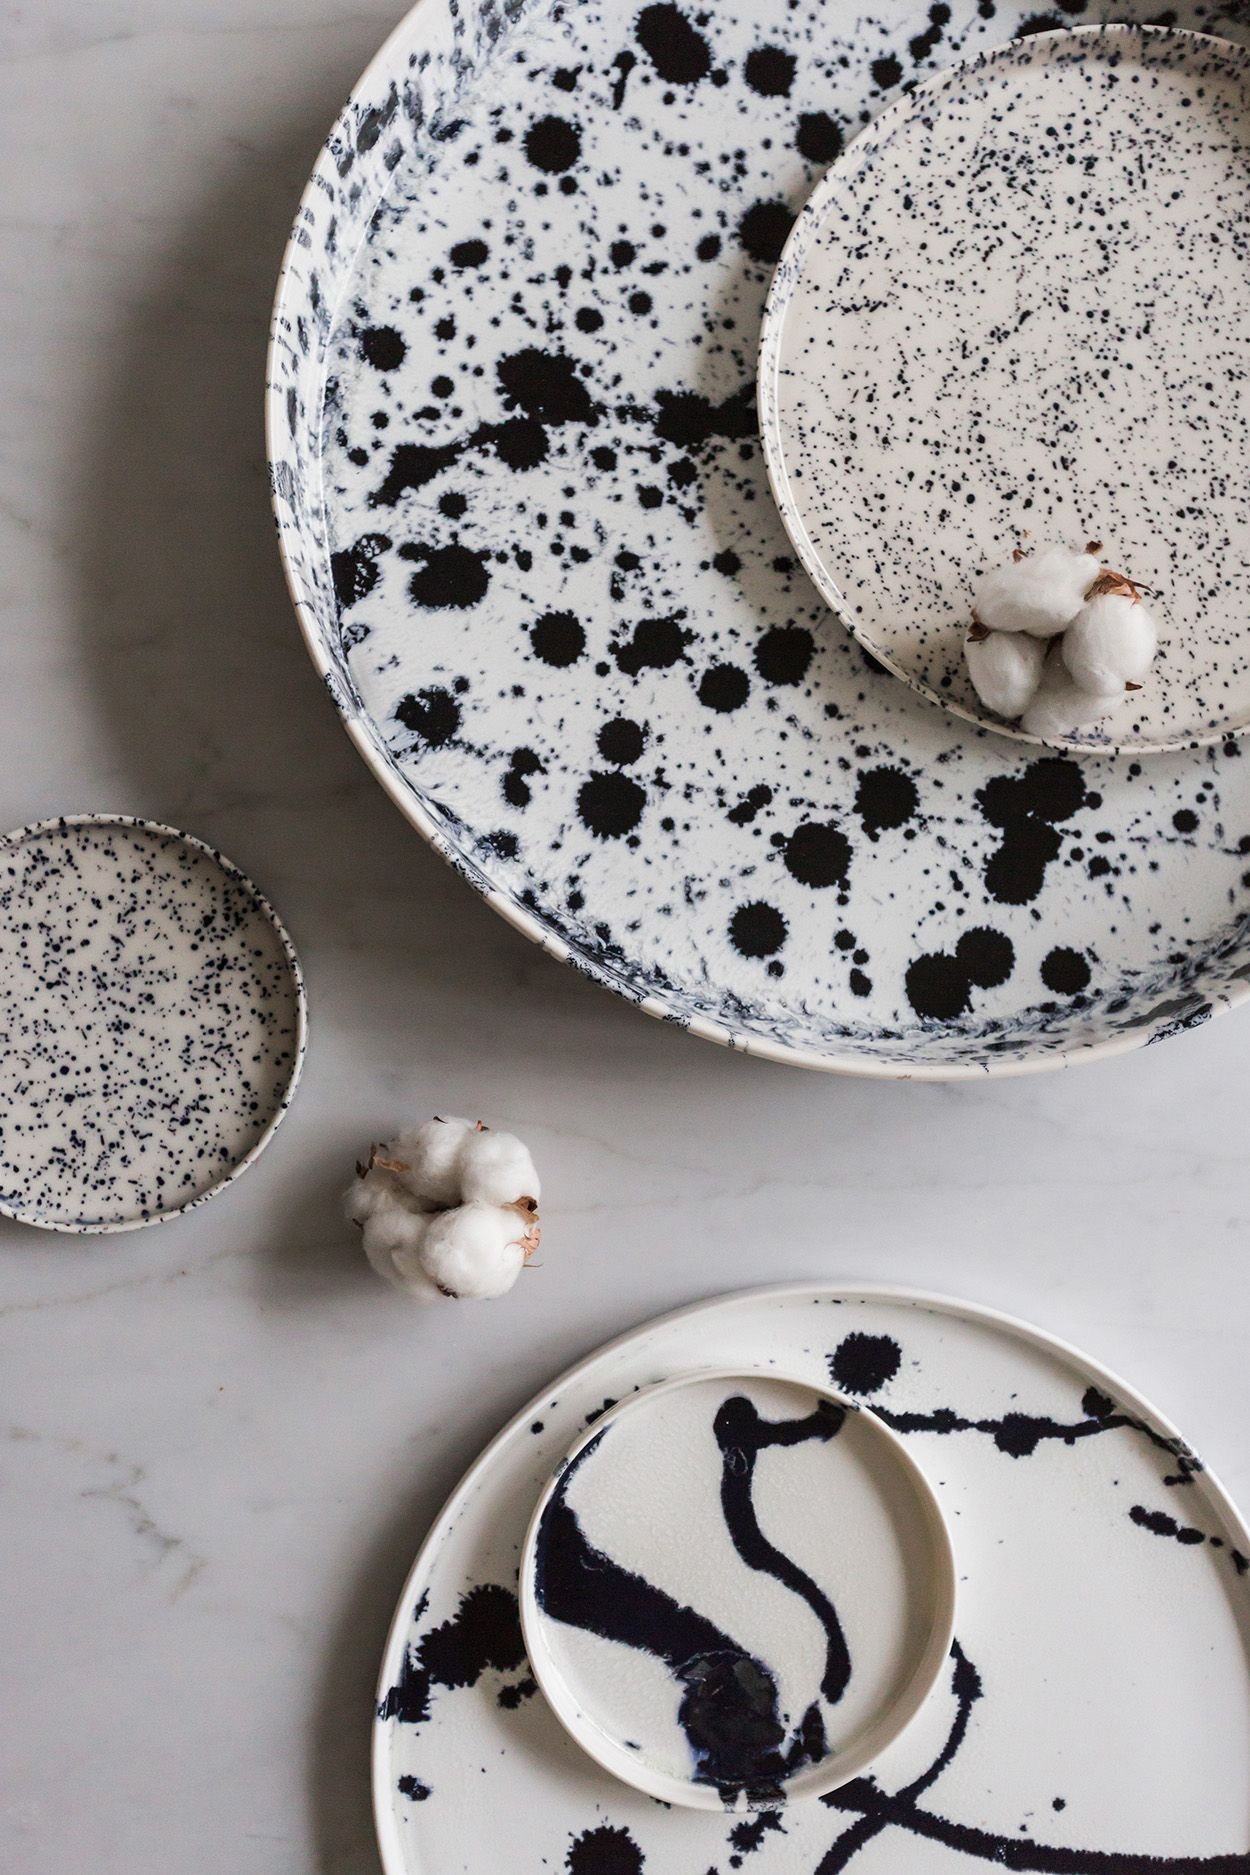 Speckled handmade ceramics